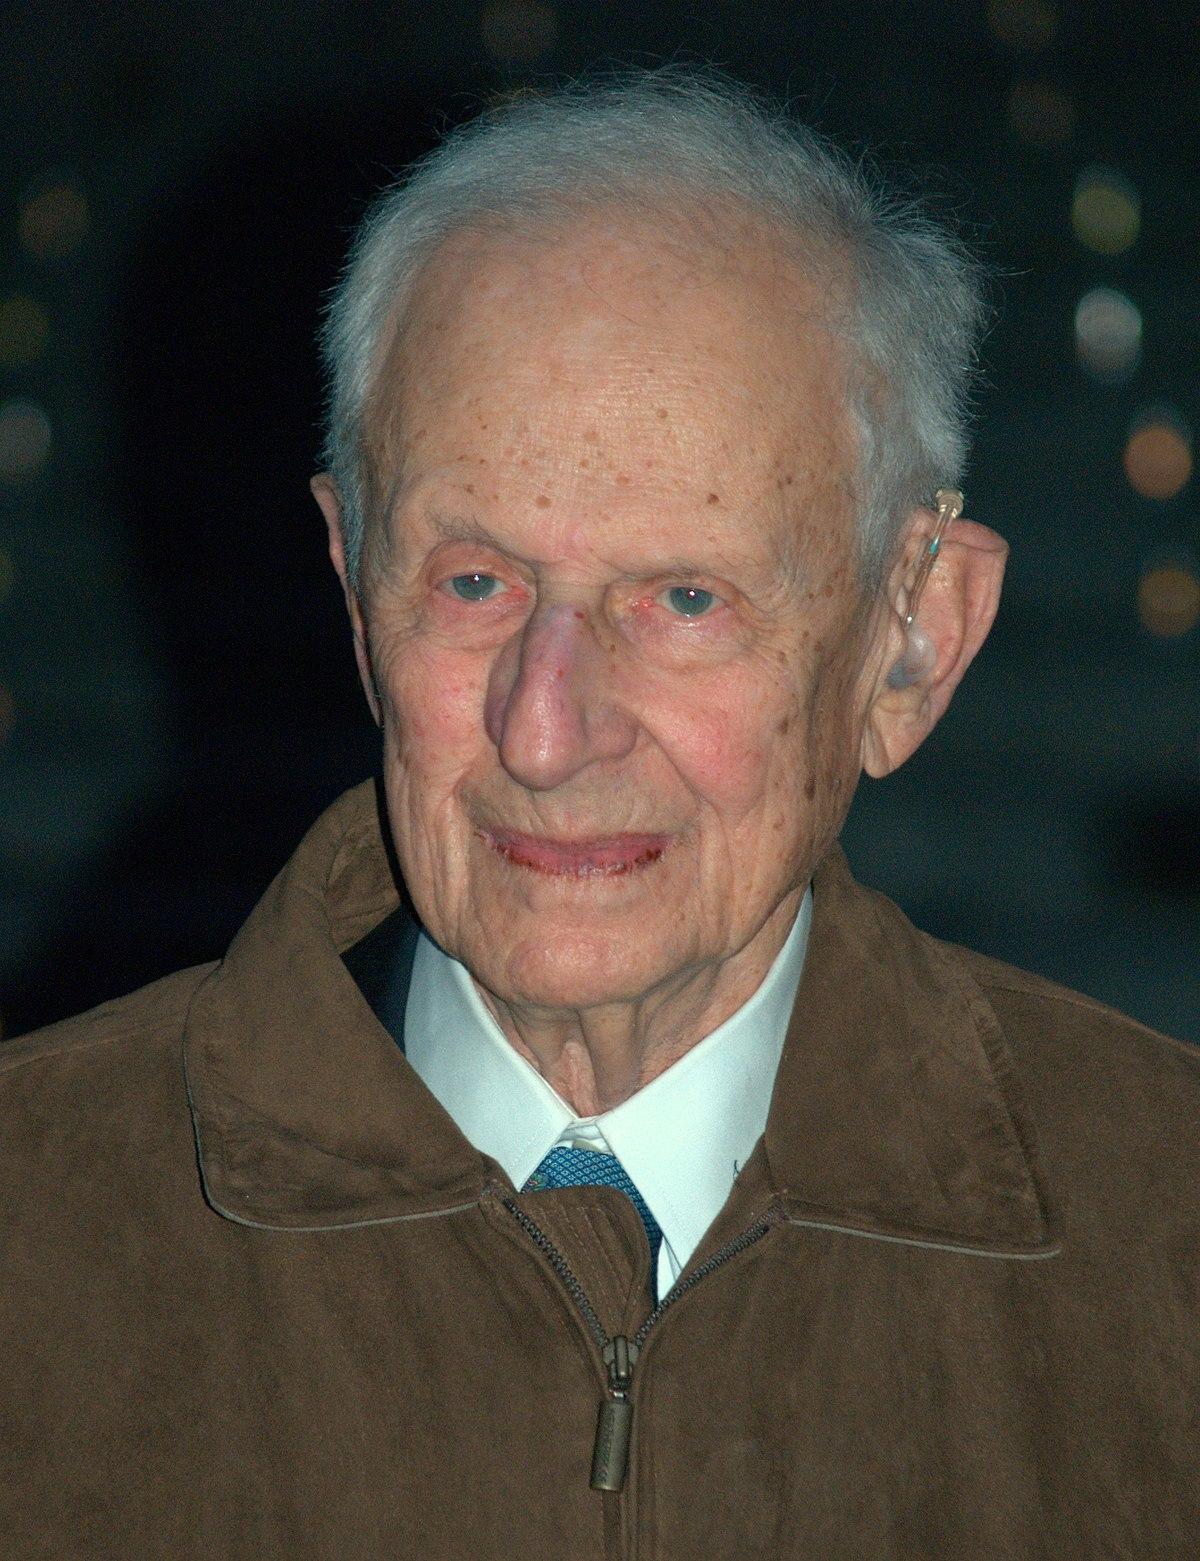 Robert Morgenthau - Wikipedia 31b20c8e2e9b1